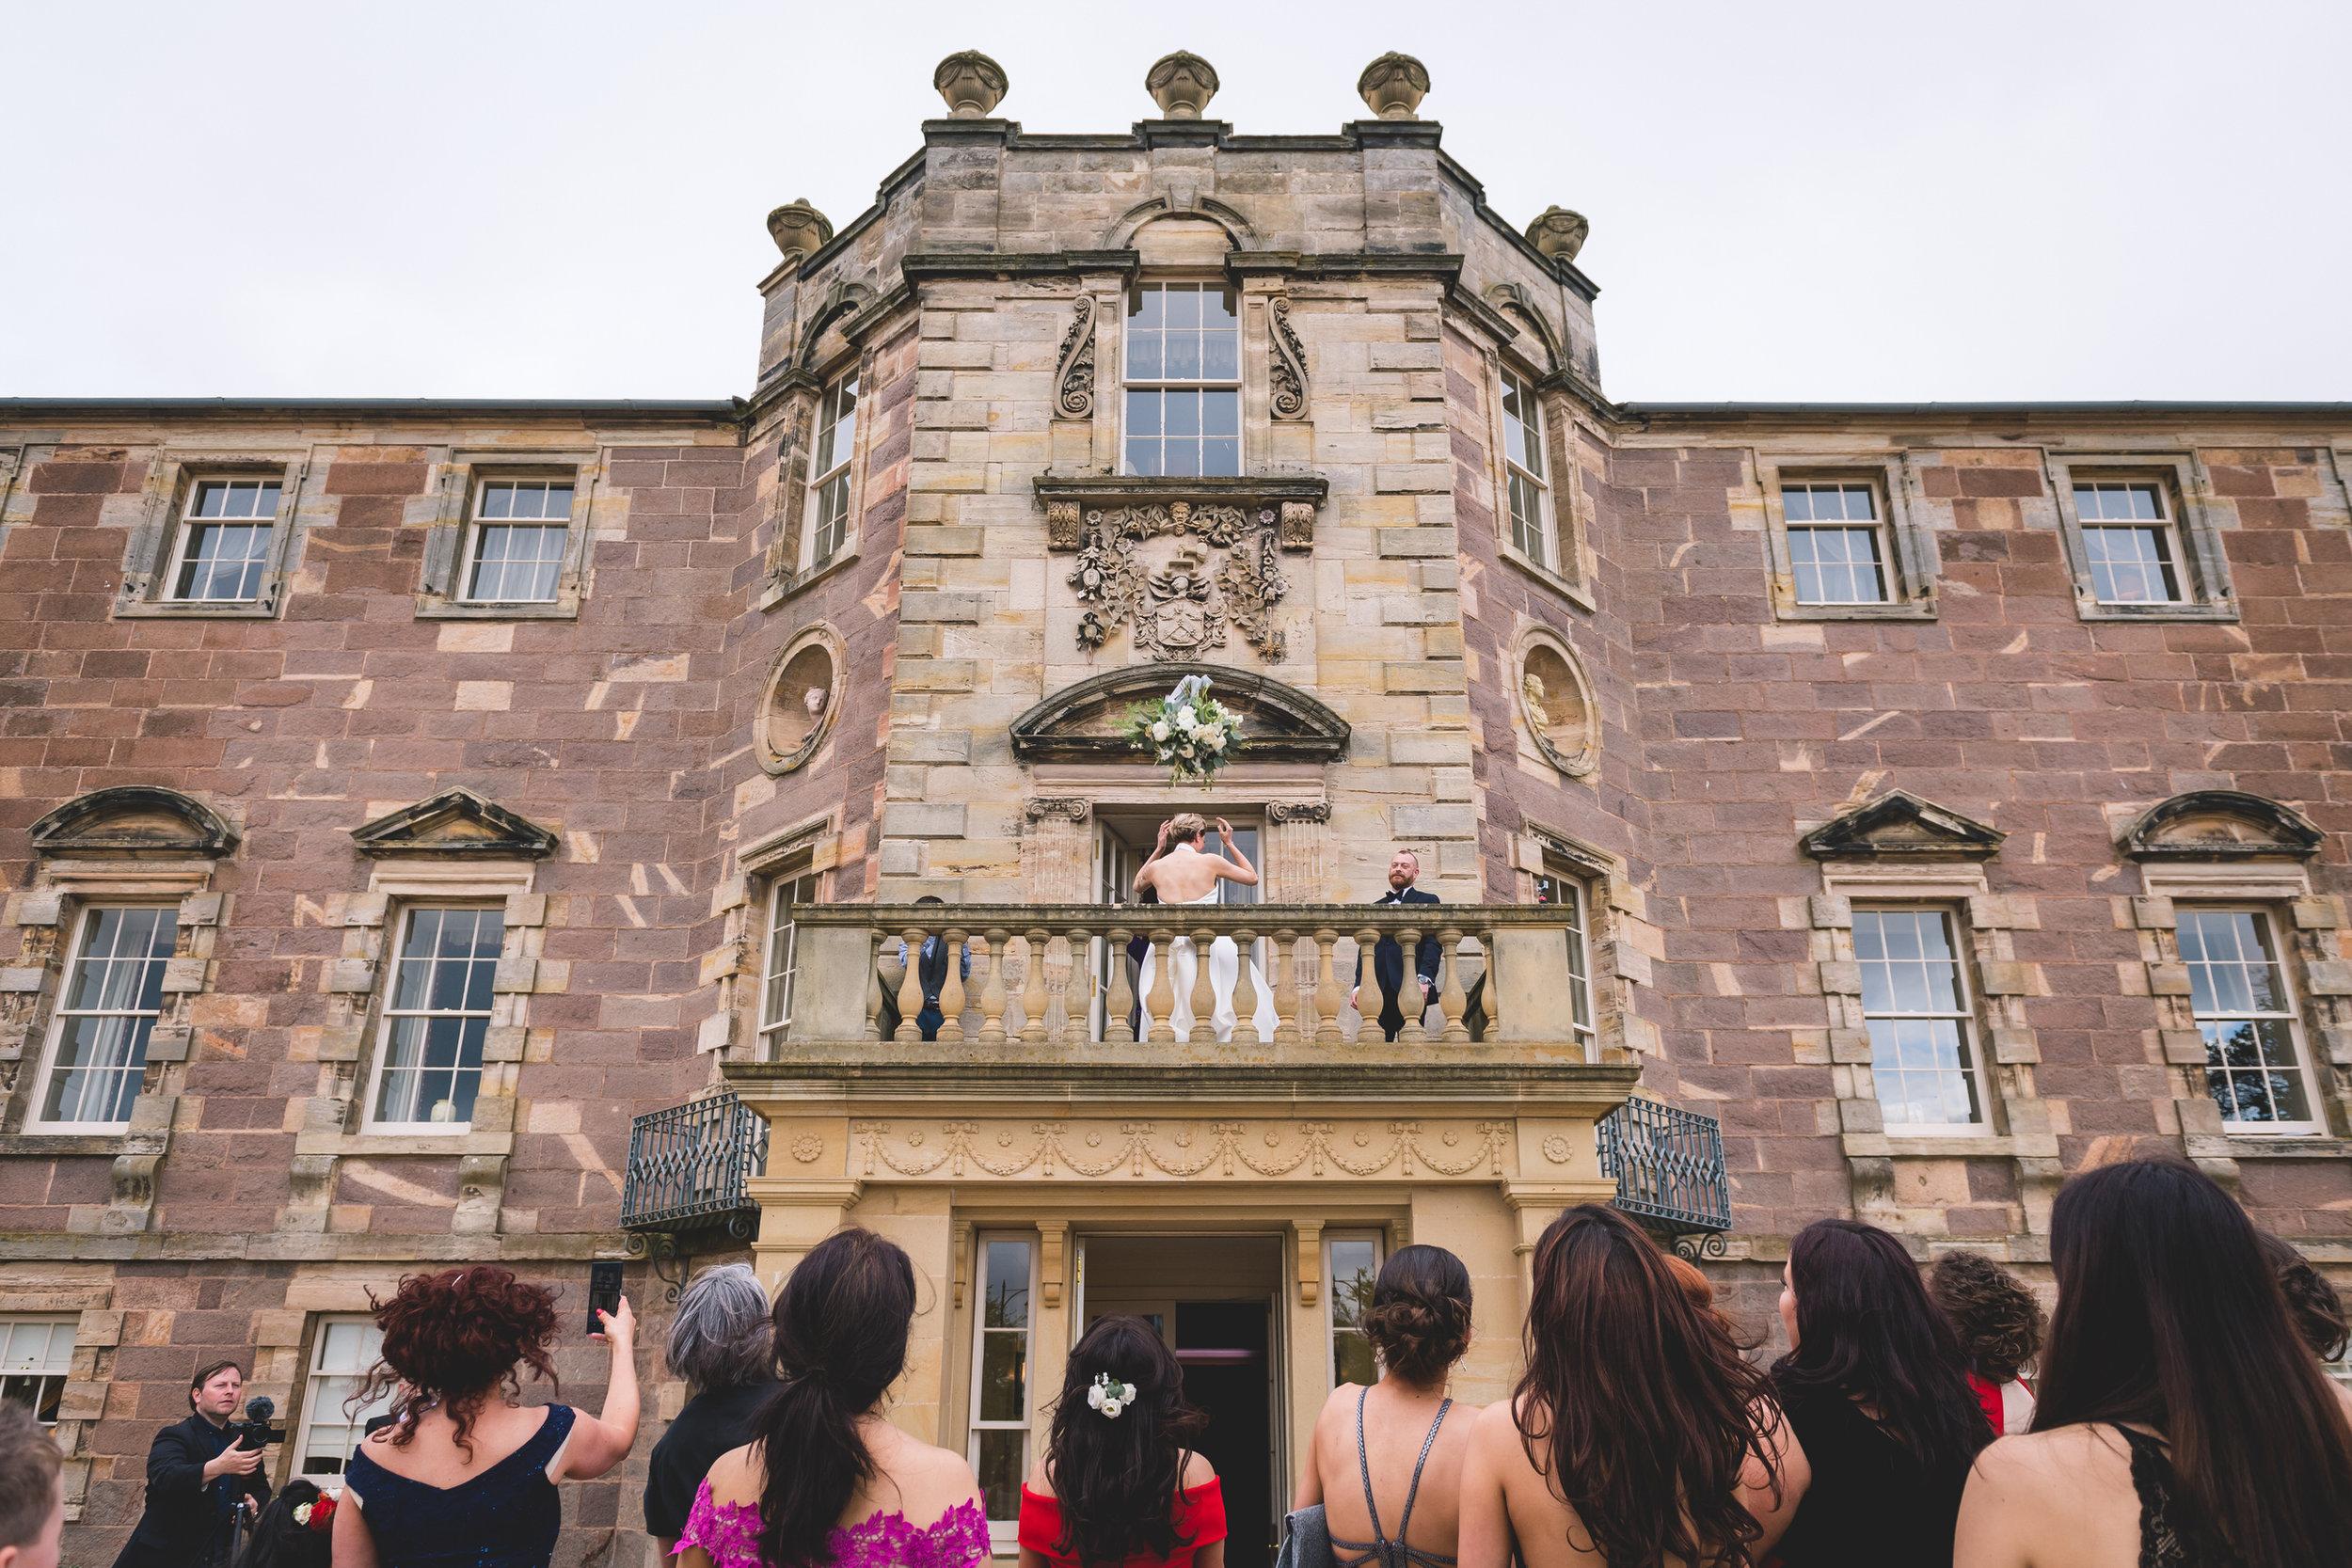 yorkshire-wedding-photographer-destination-archerfield-house-19.jpg